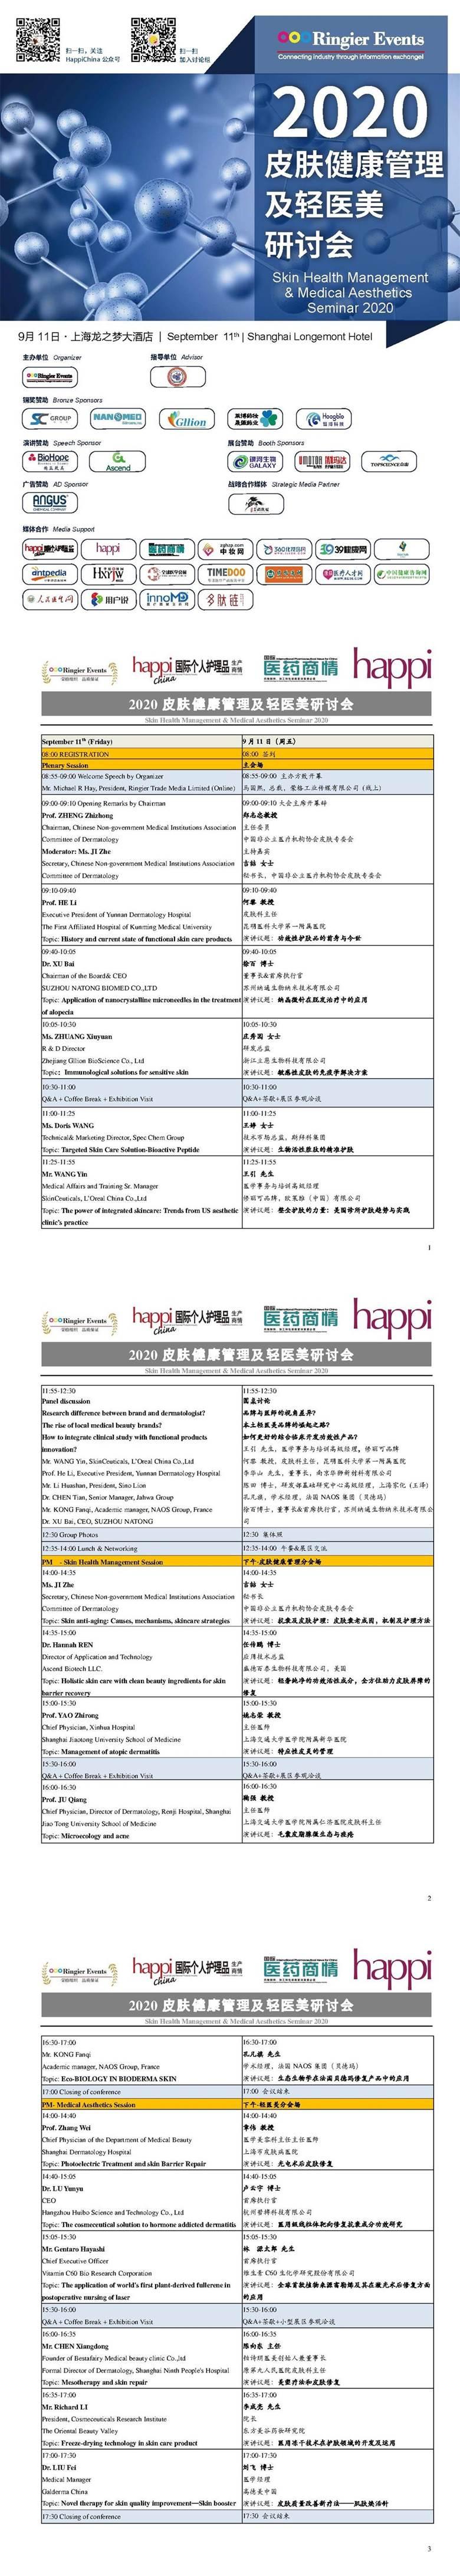 CMA2020轻医美 final agenda-tiomg-append-image.jpg